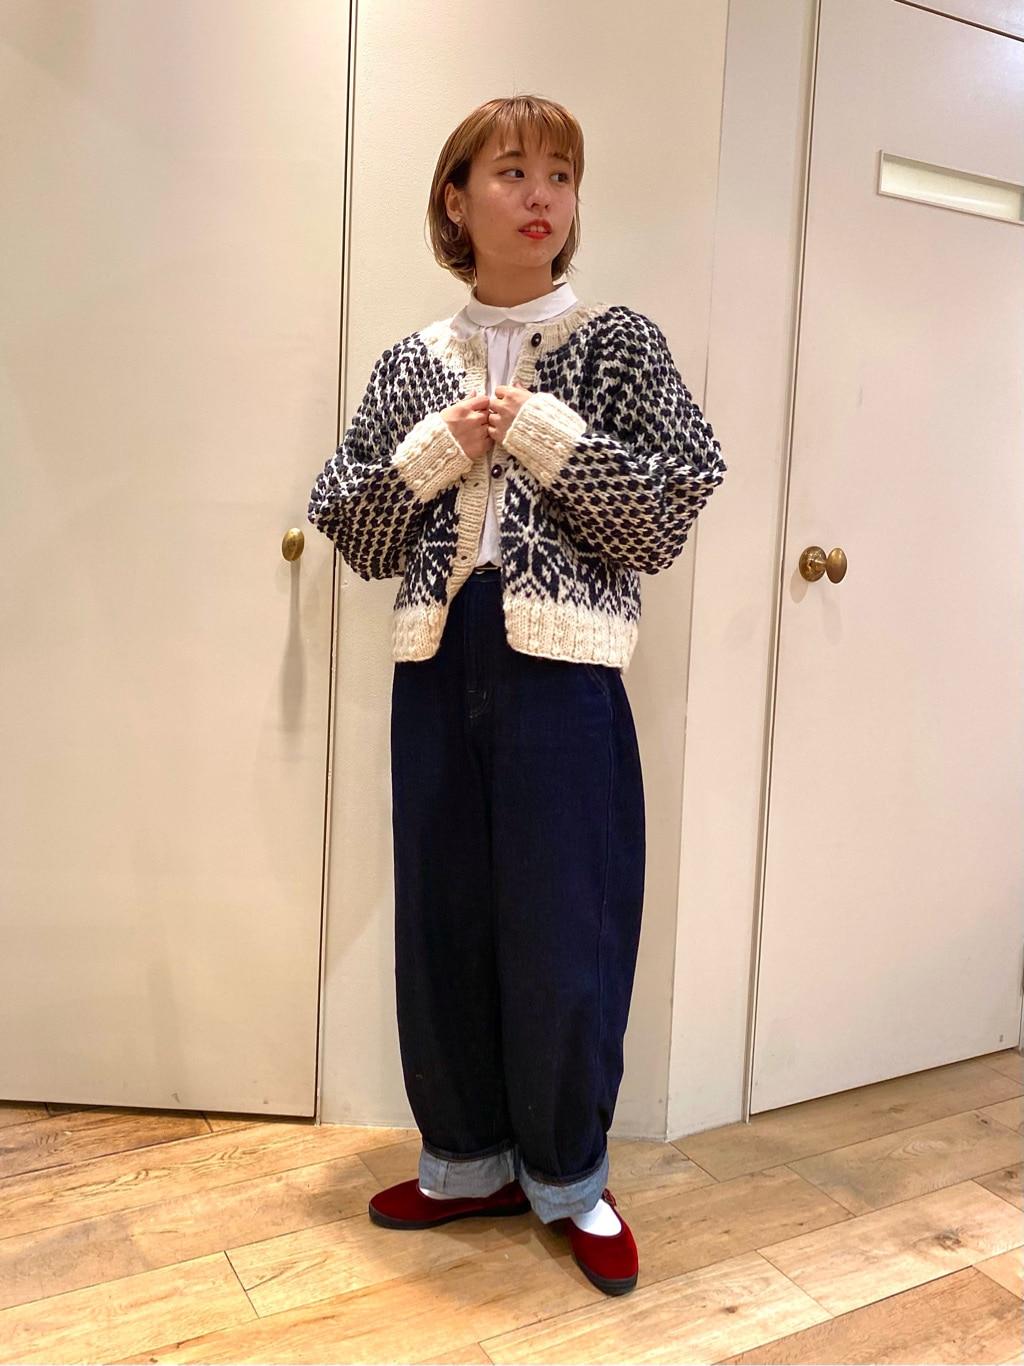 bulle de savon 新宿ミロード 身長:157cm 2020.09.27